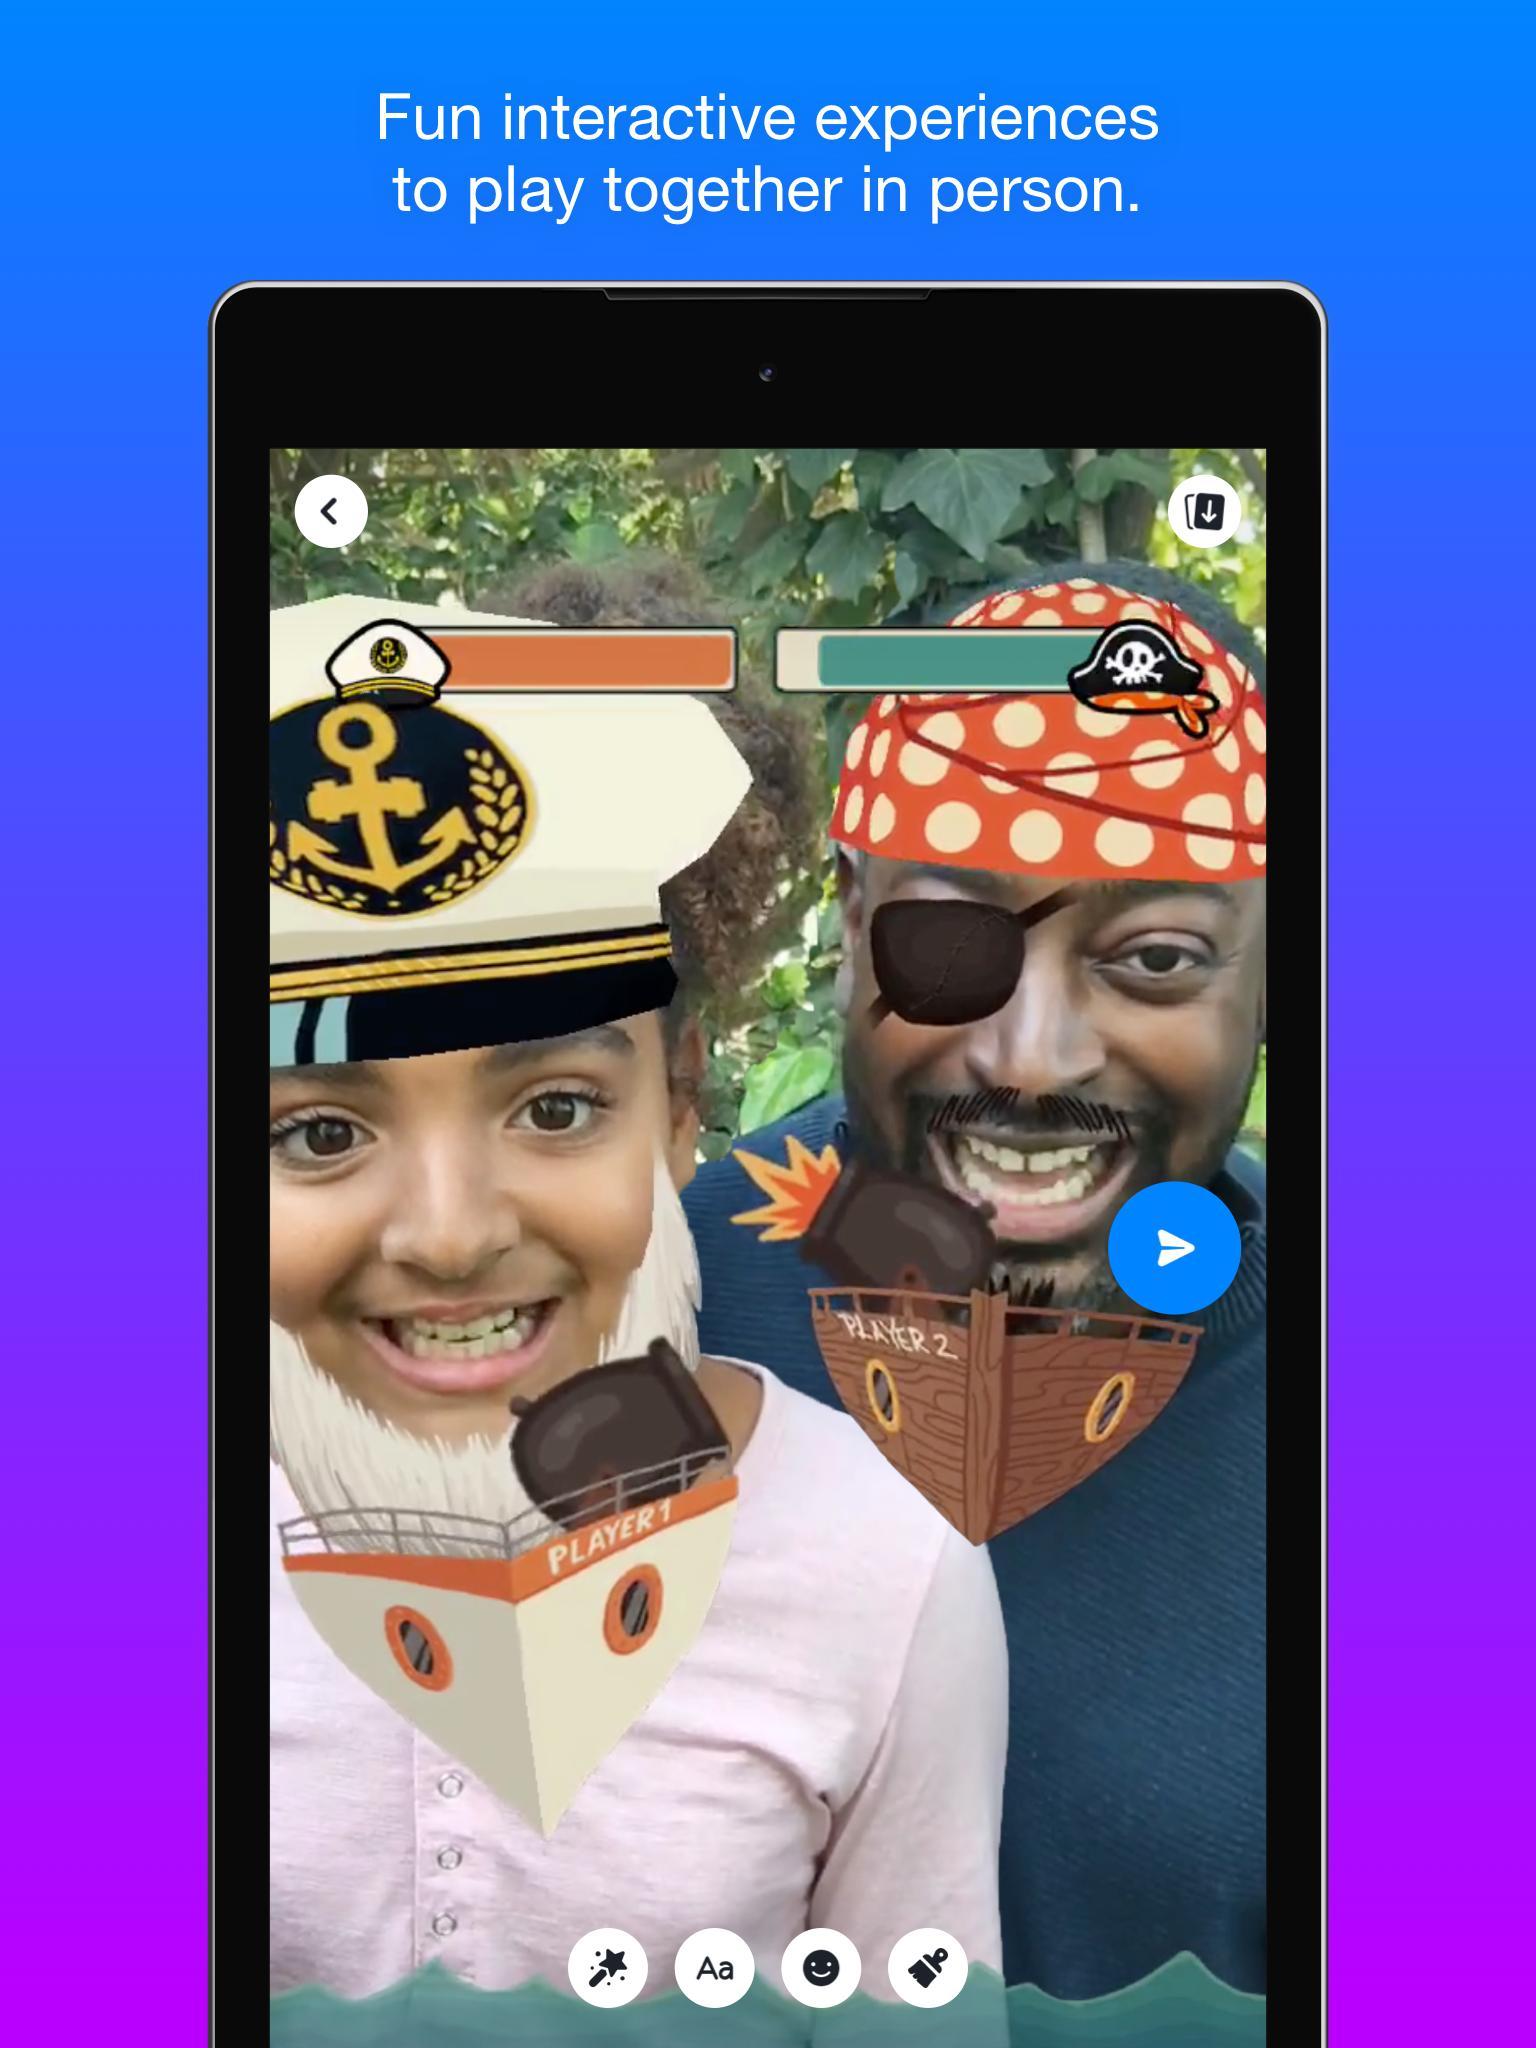 Messenger Kids – Safer Messaging and Video Chat 103.0.0.6.112 Screenshot 23